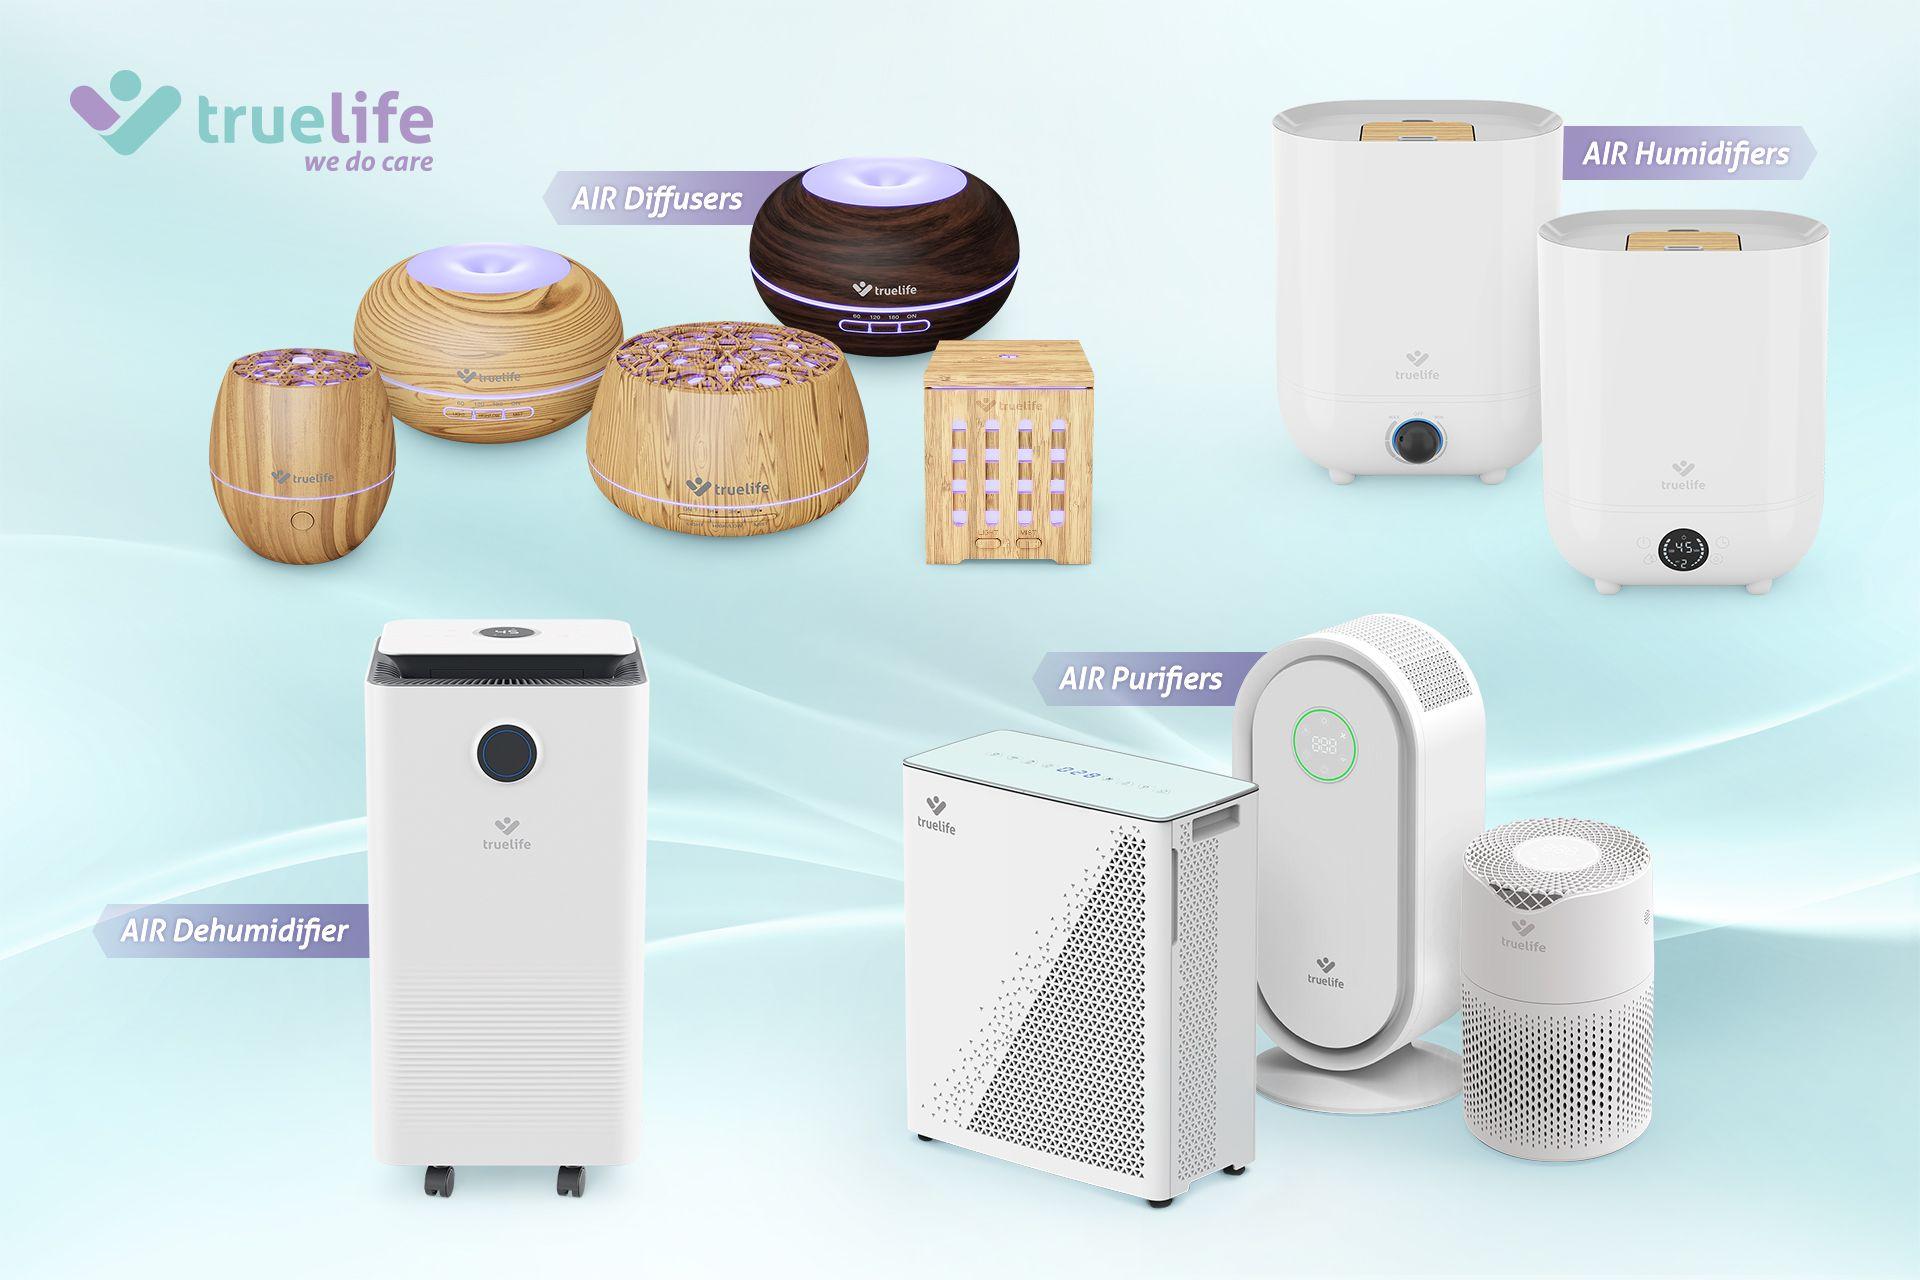 TrueLife AIR Program - Péče o vzduch